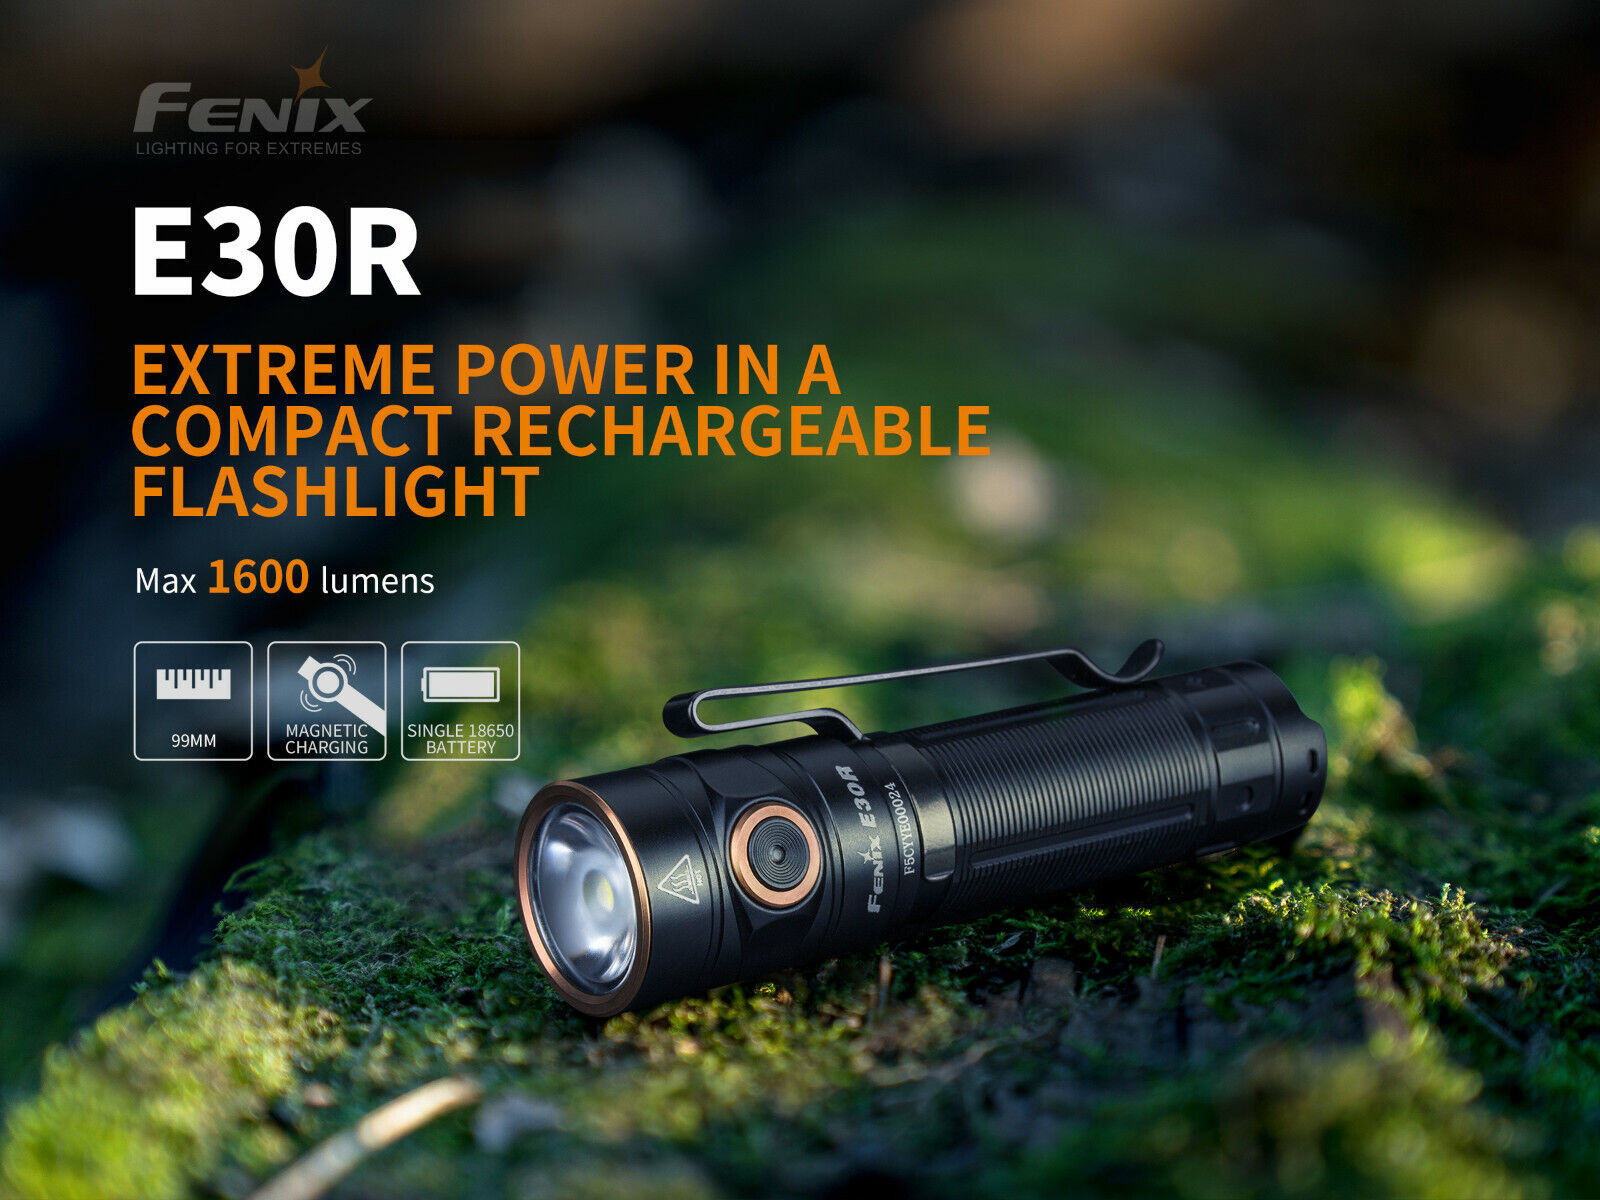 Fenix E30R LED Taschenlampe mit 1600 Lumen, USB Anschluss, inkl. 3500mAh Akku